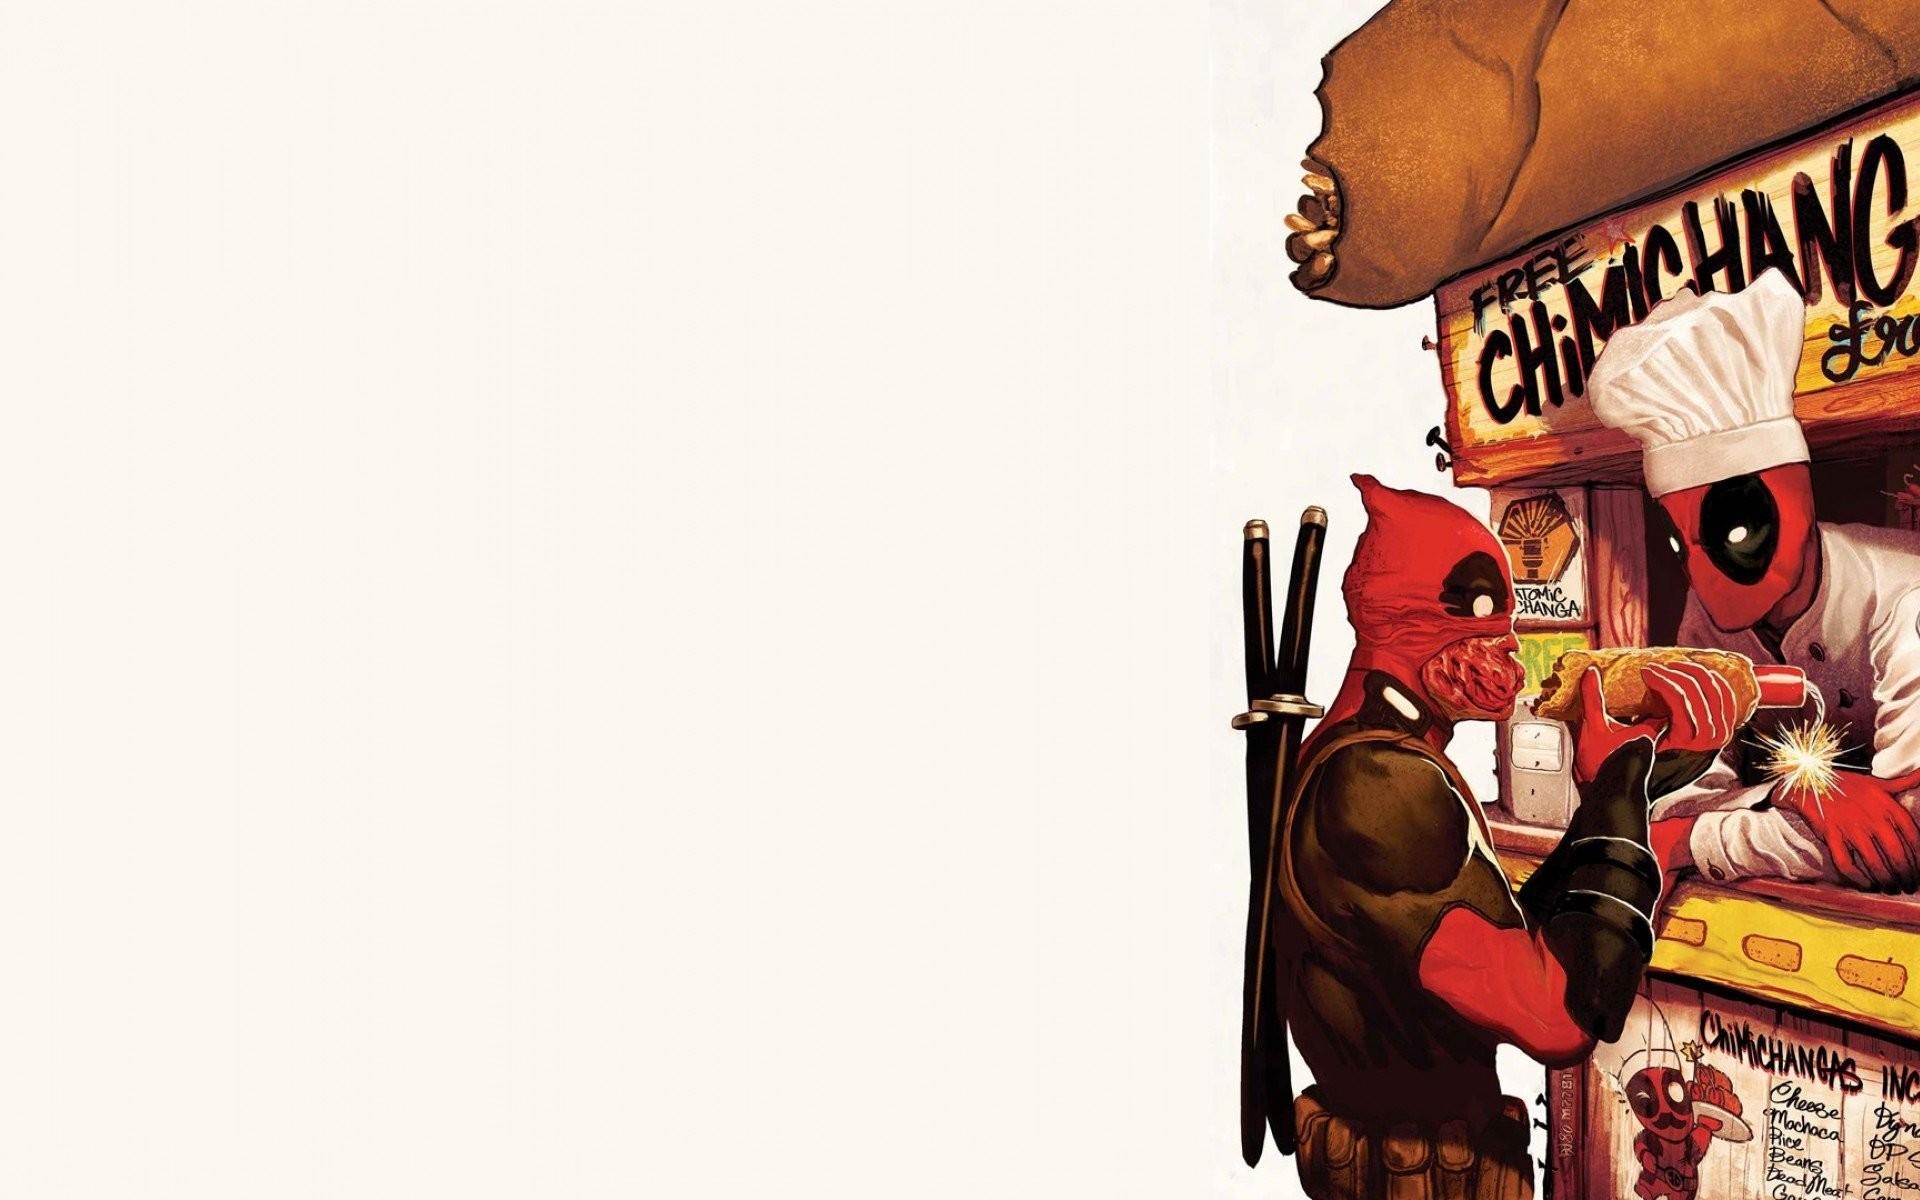 deadpool-wallpaper-hotdogs-wilson-comics-wallpapers